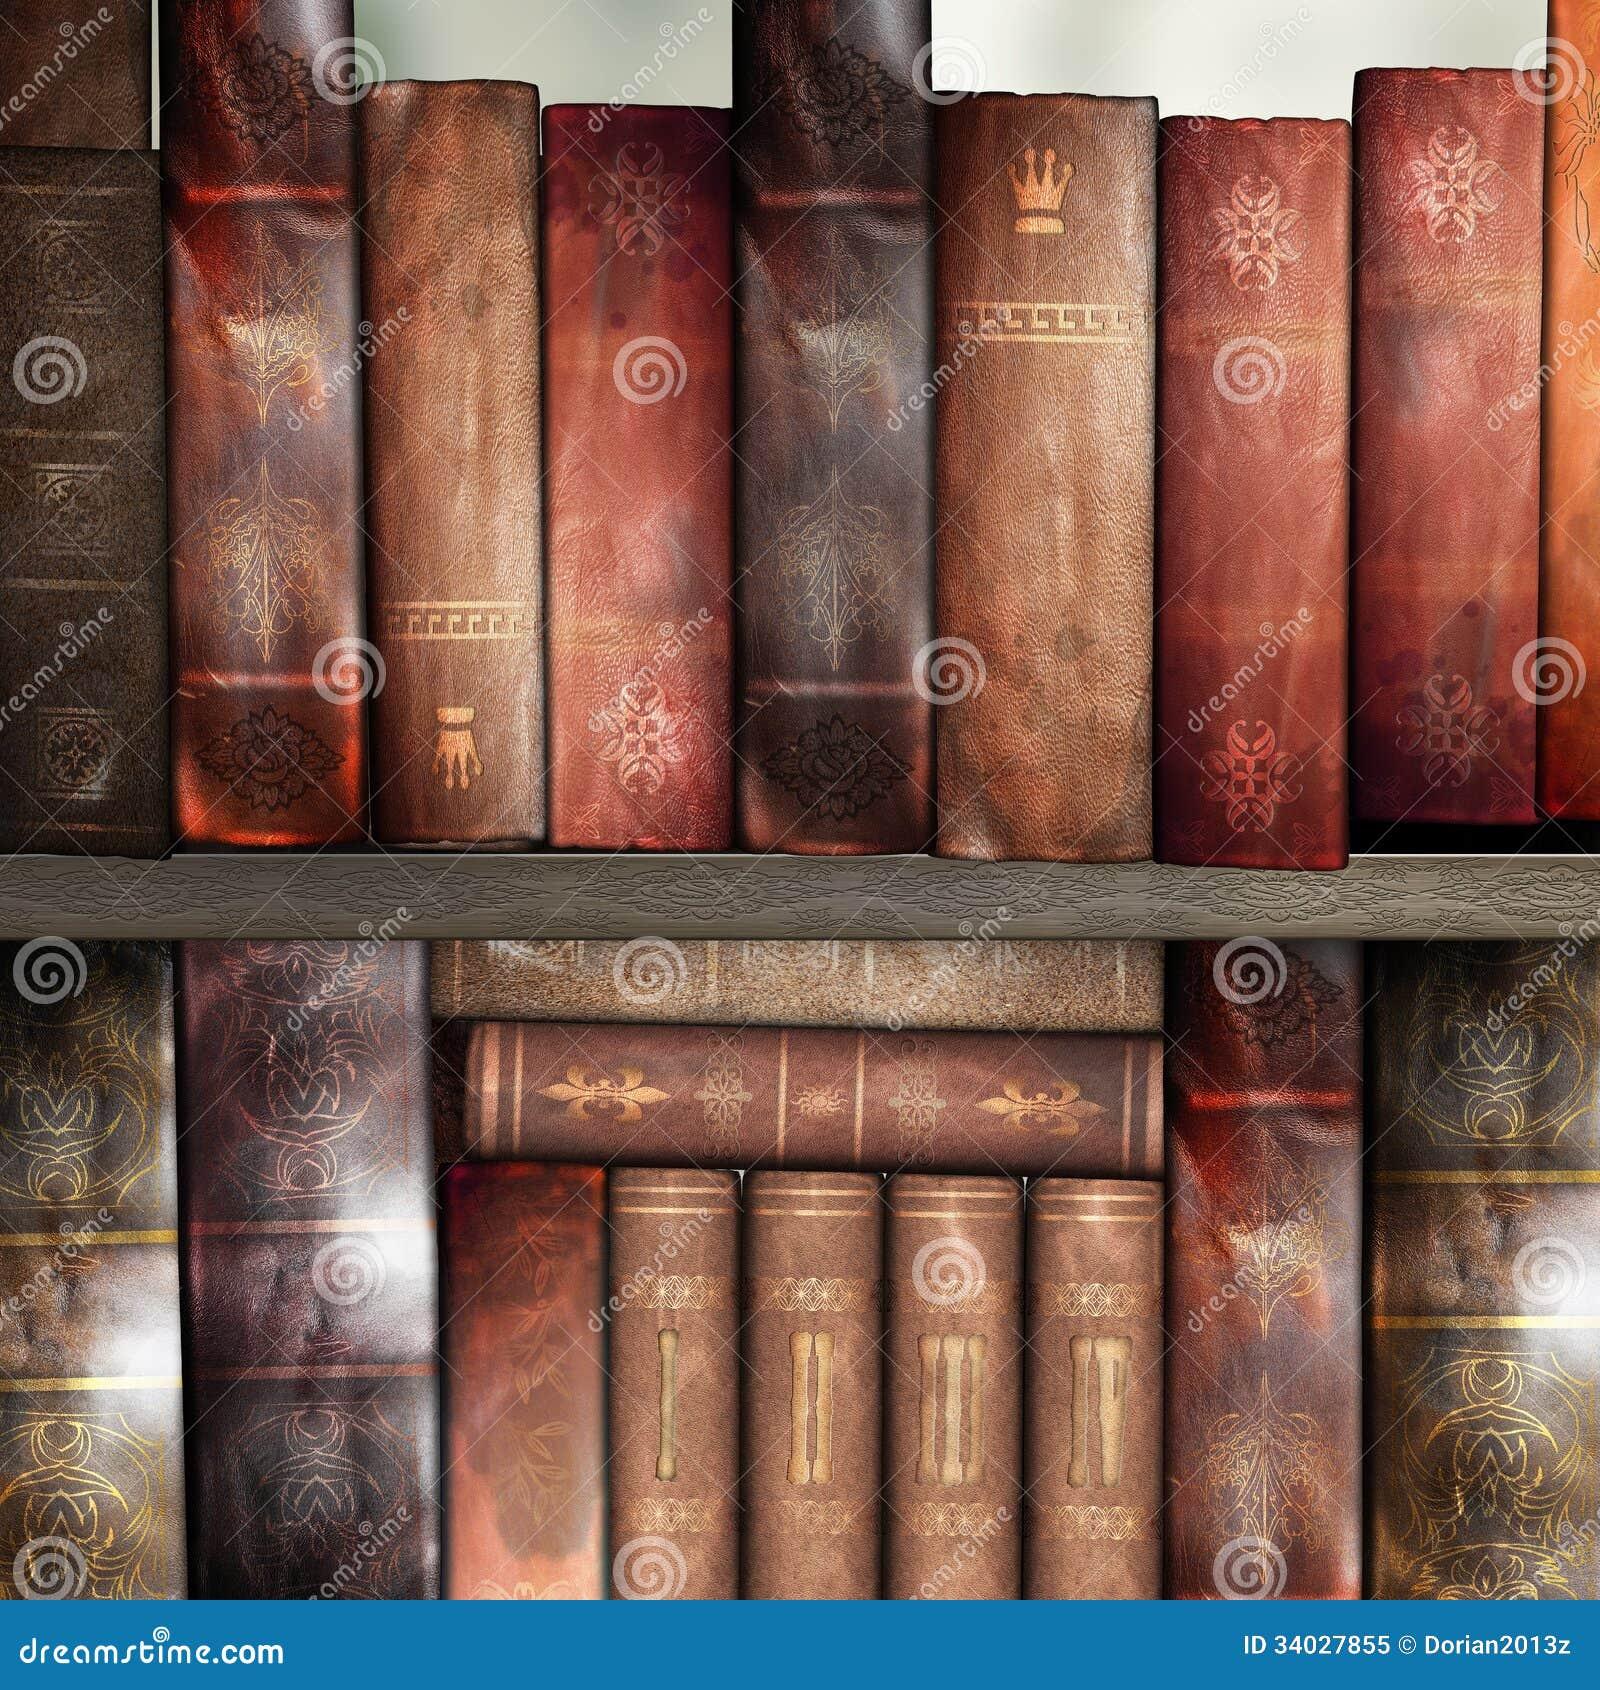 Old Books, Library Stock Image. Image Of Bookshelf